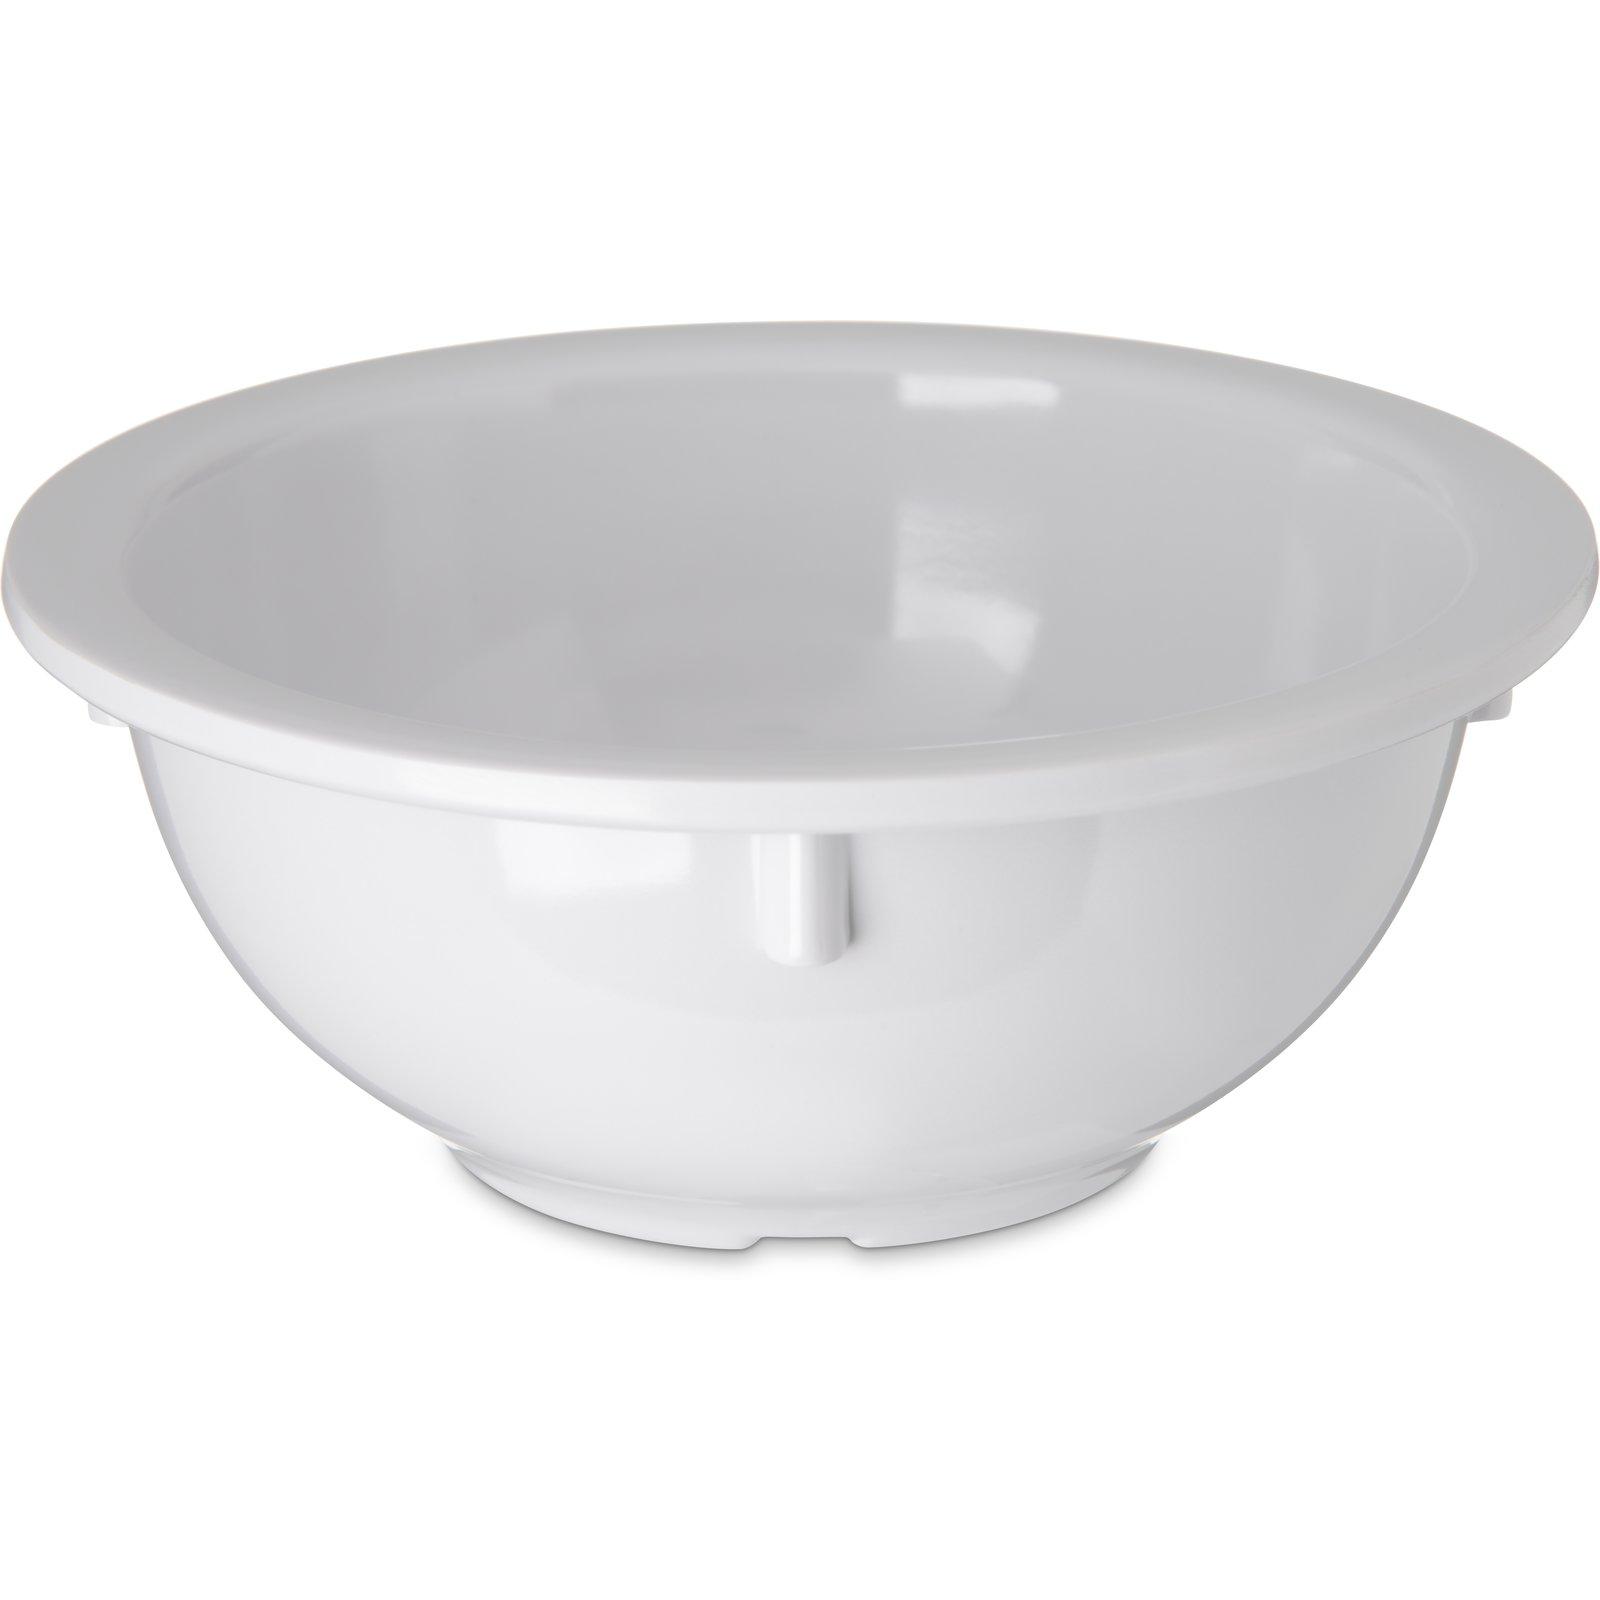 4352202 Dallas Ware Melamine Rimmed Nappie Bowl 14oz White Carlisle Foodservice Products